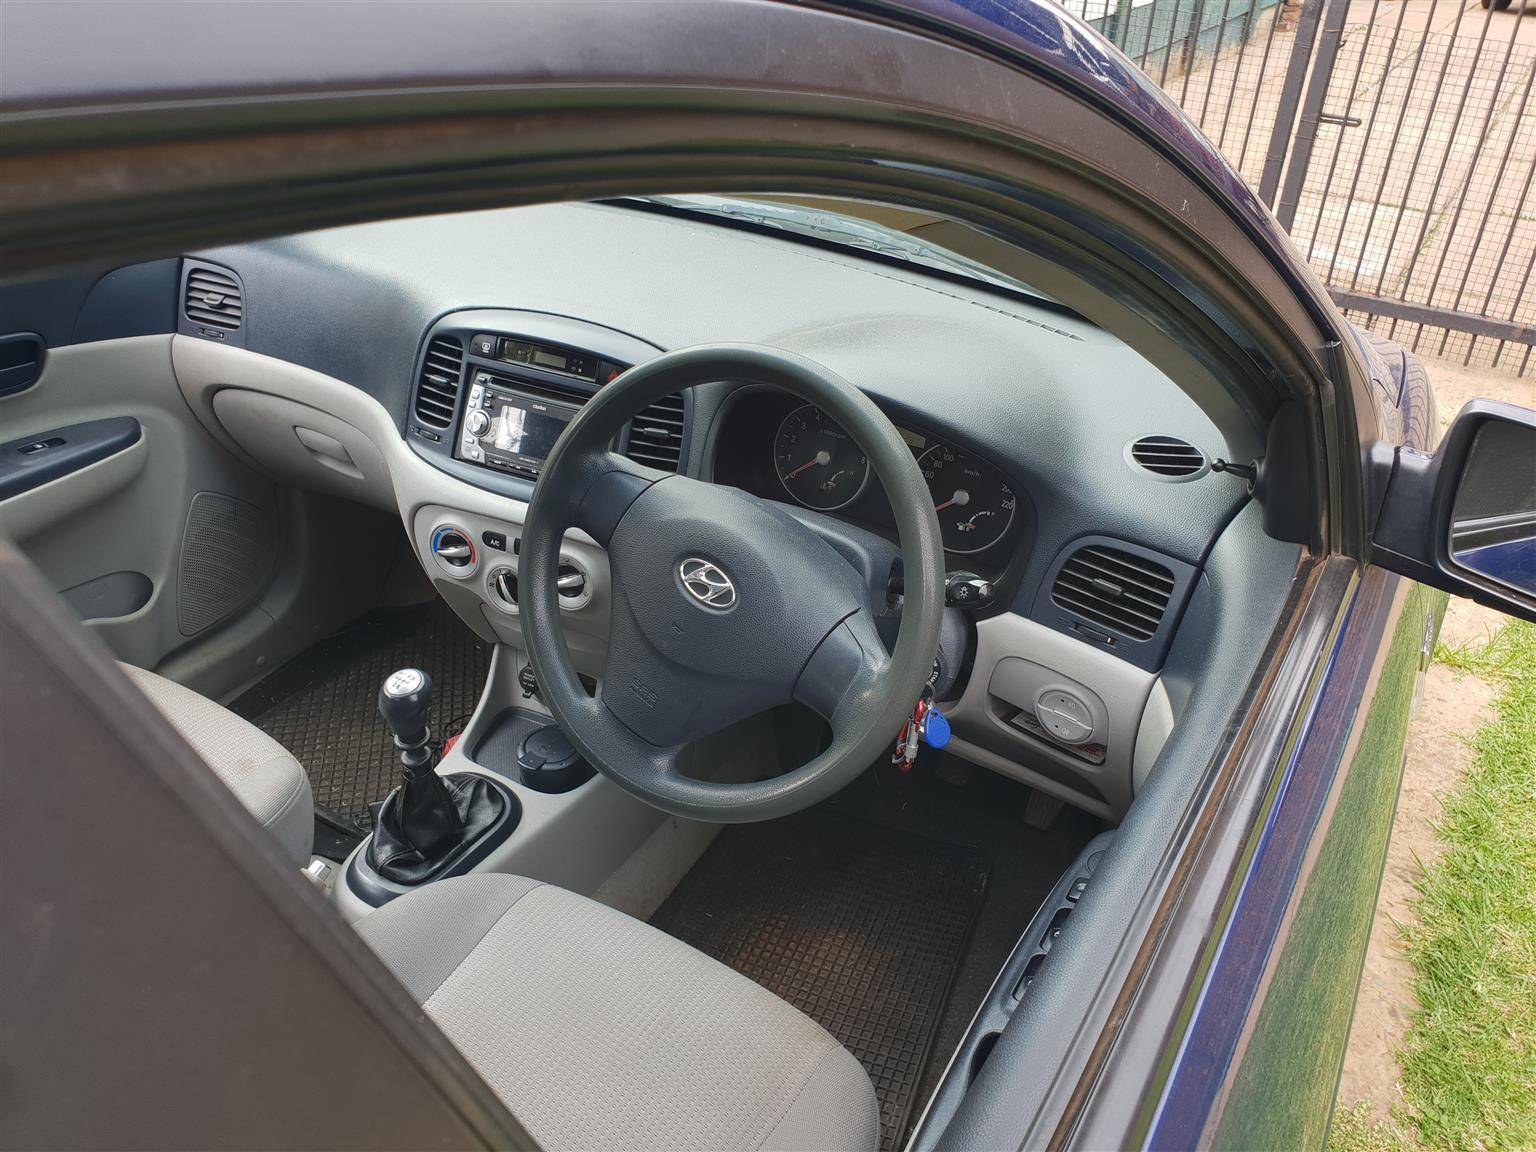 2006 Hyundai Accent 1.6 GL